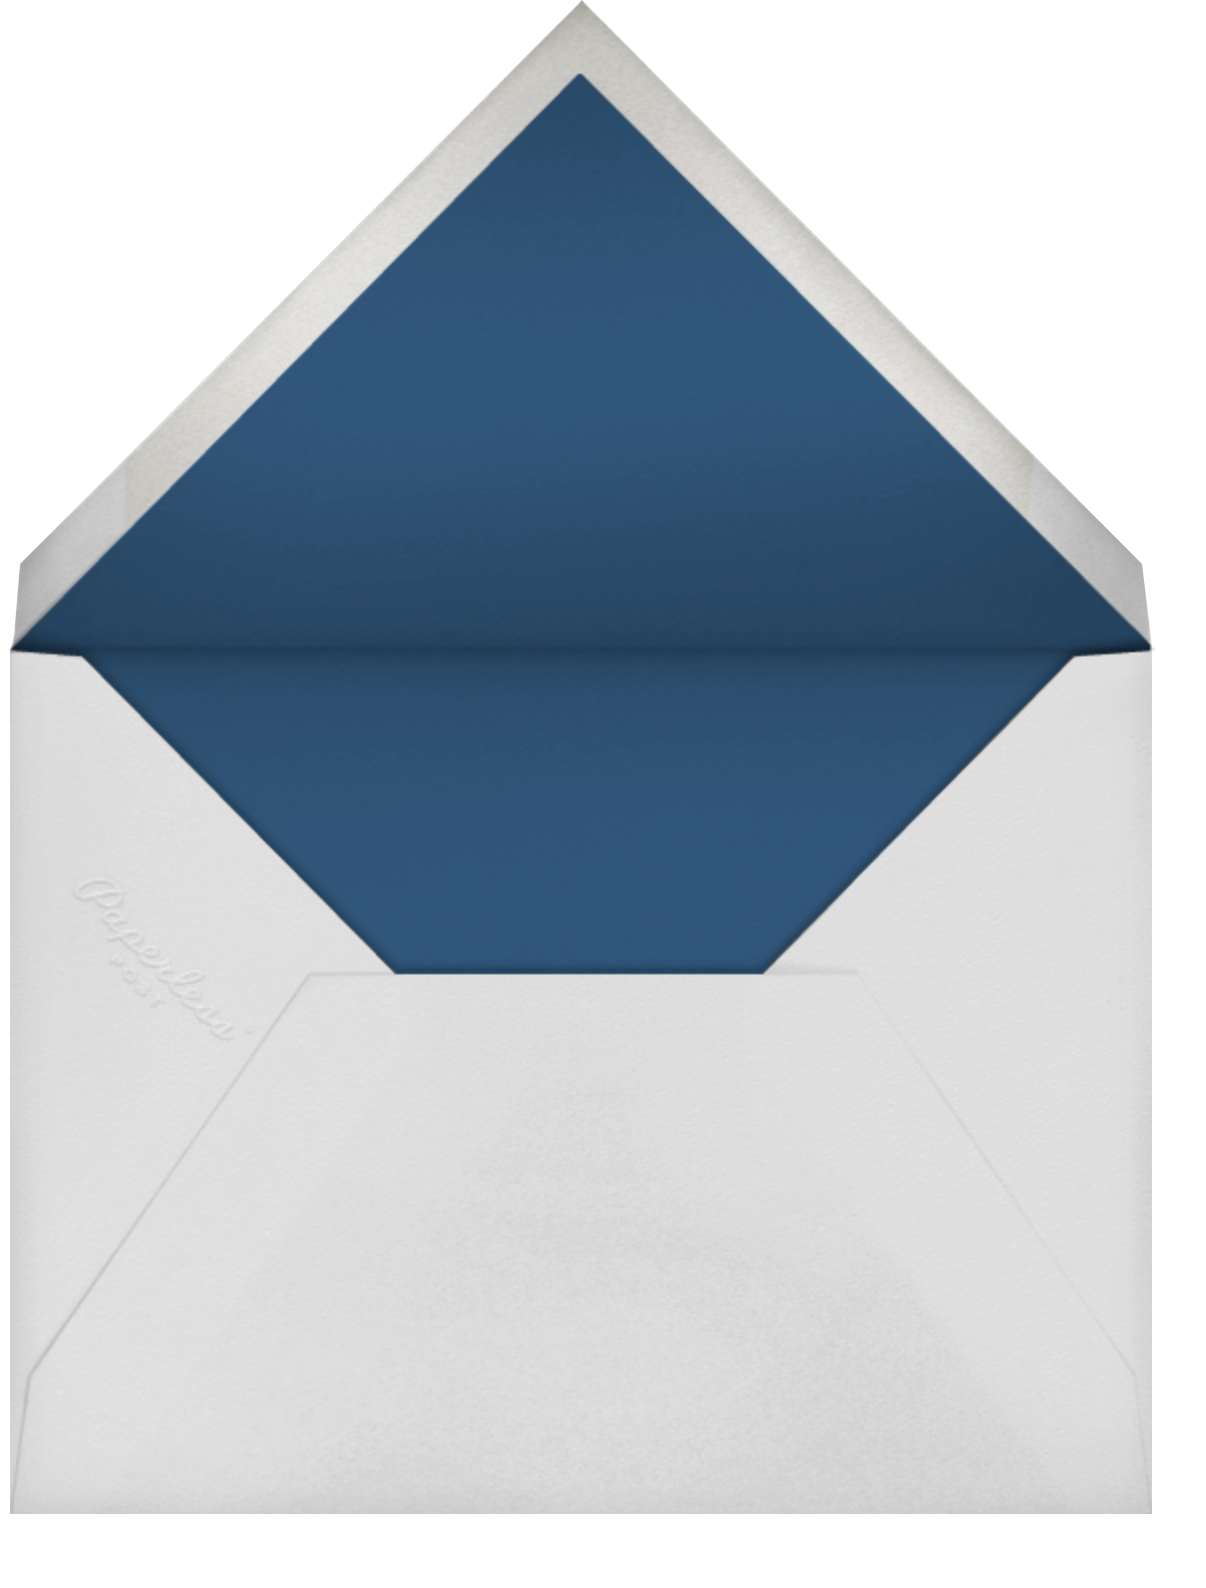 Let it Snow (Invite) - kate spade new york - Envelope